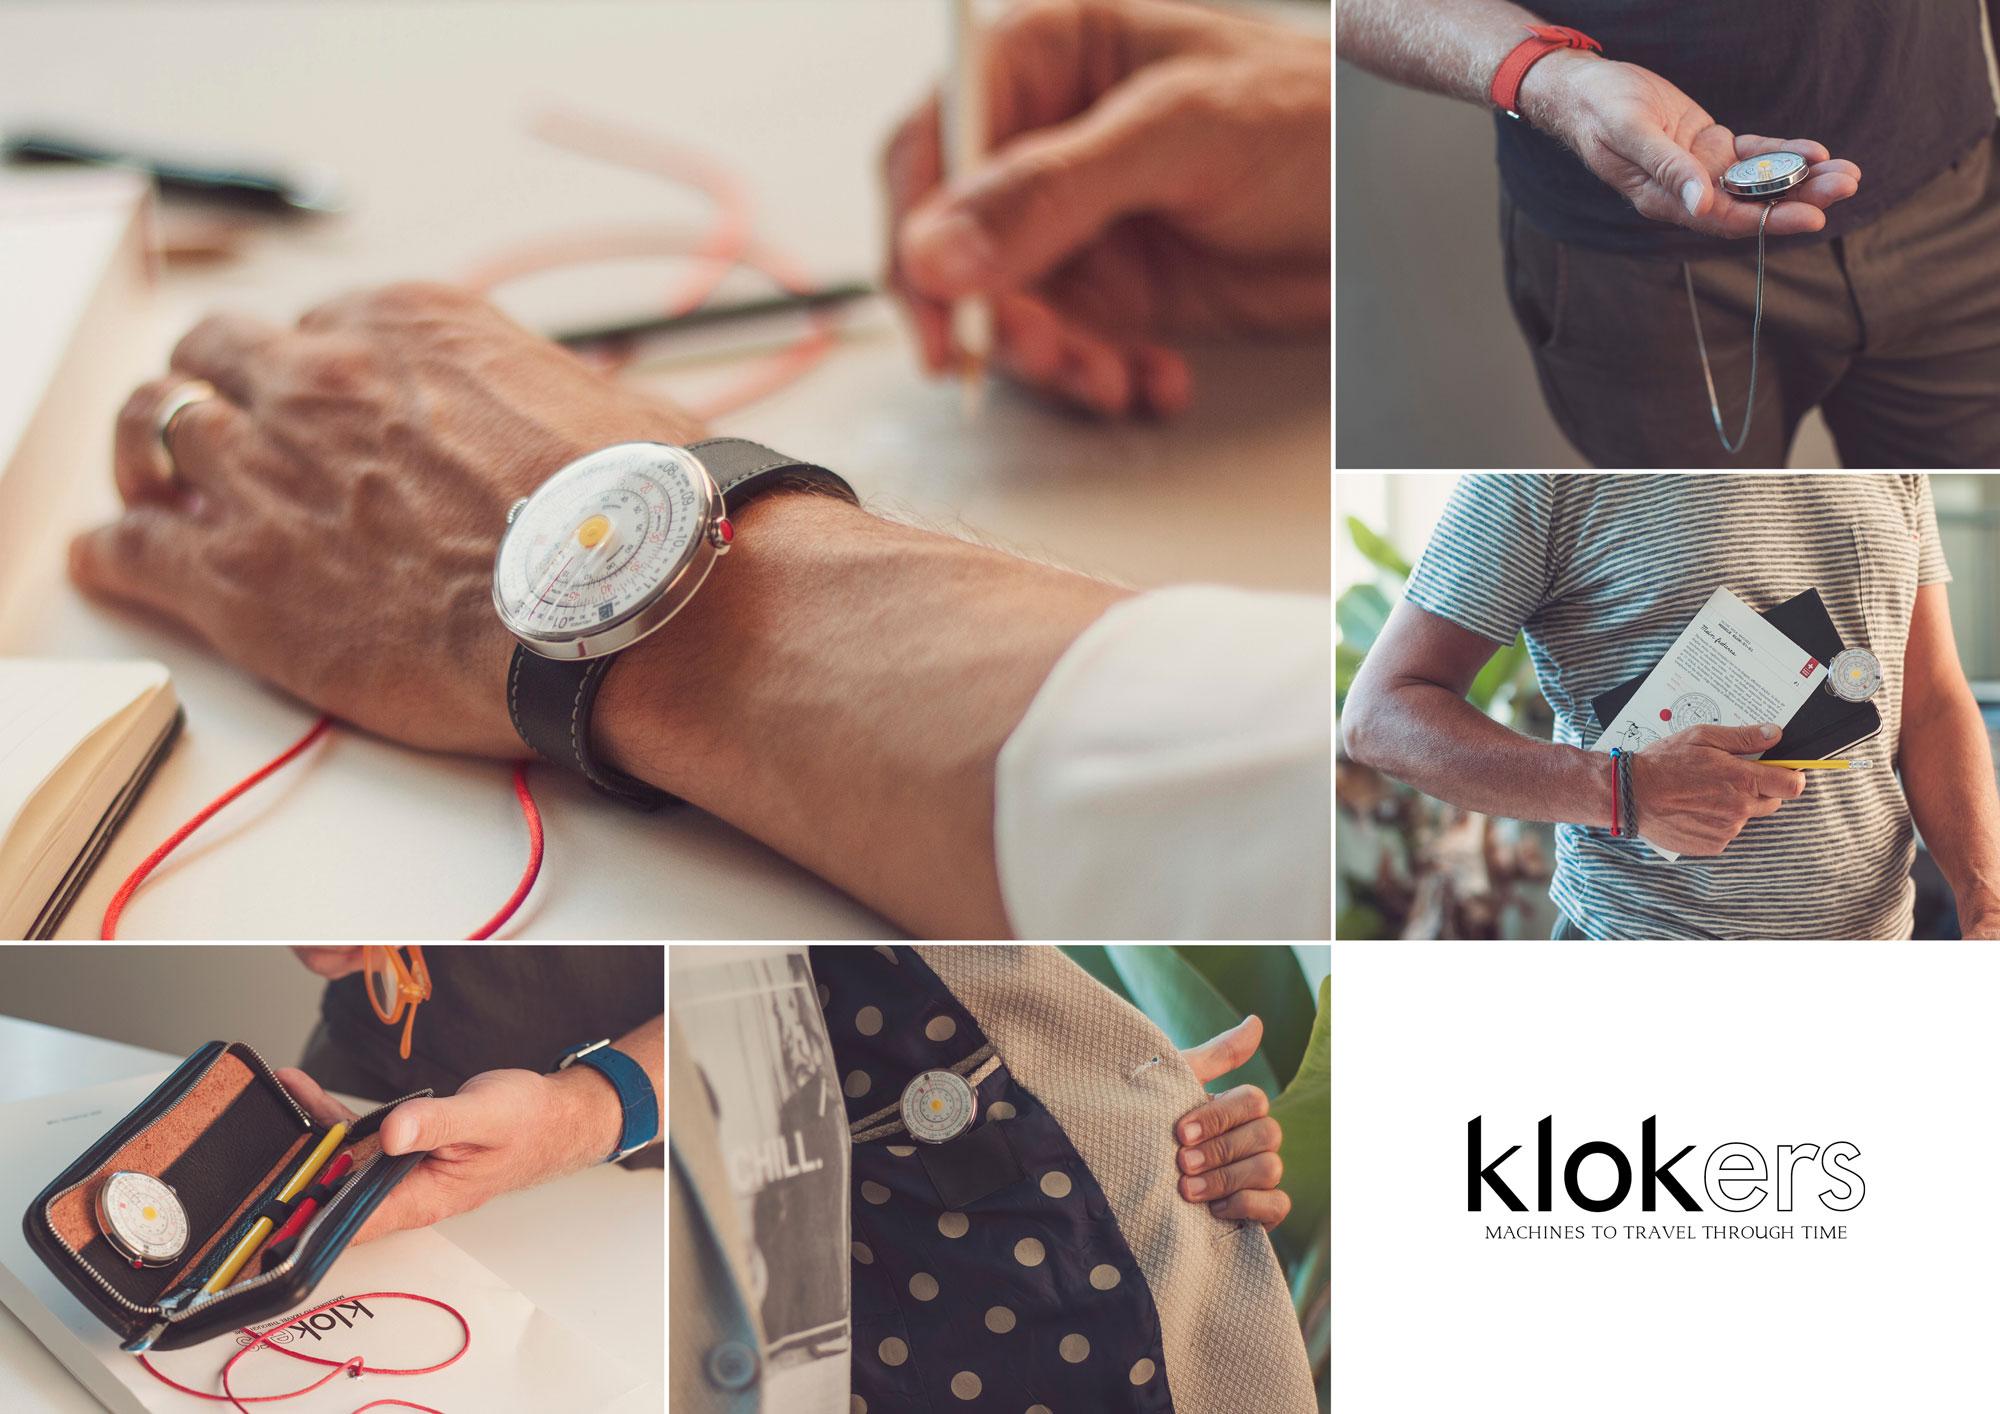 klokers: Machines to travel through time